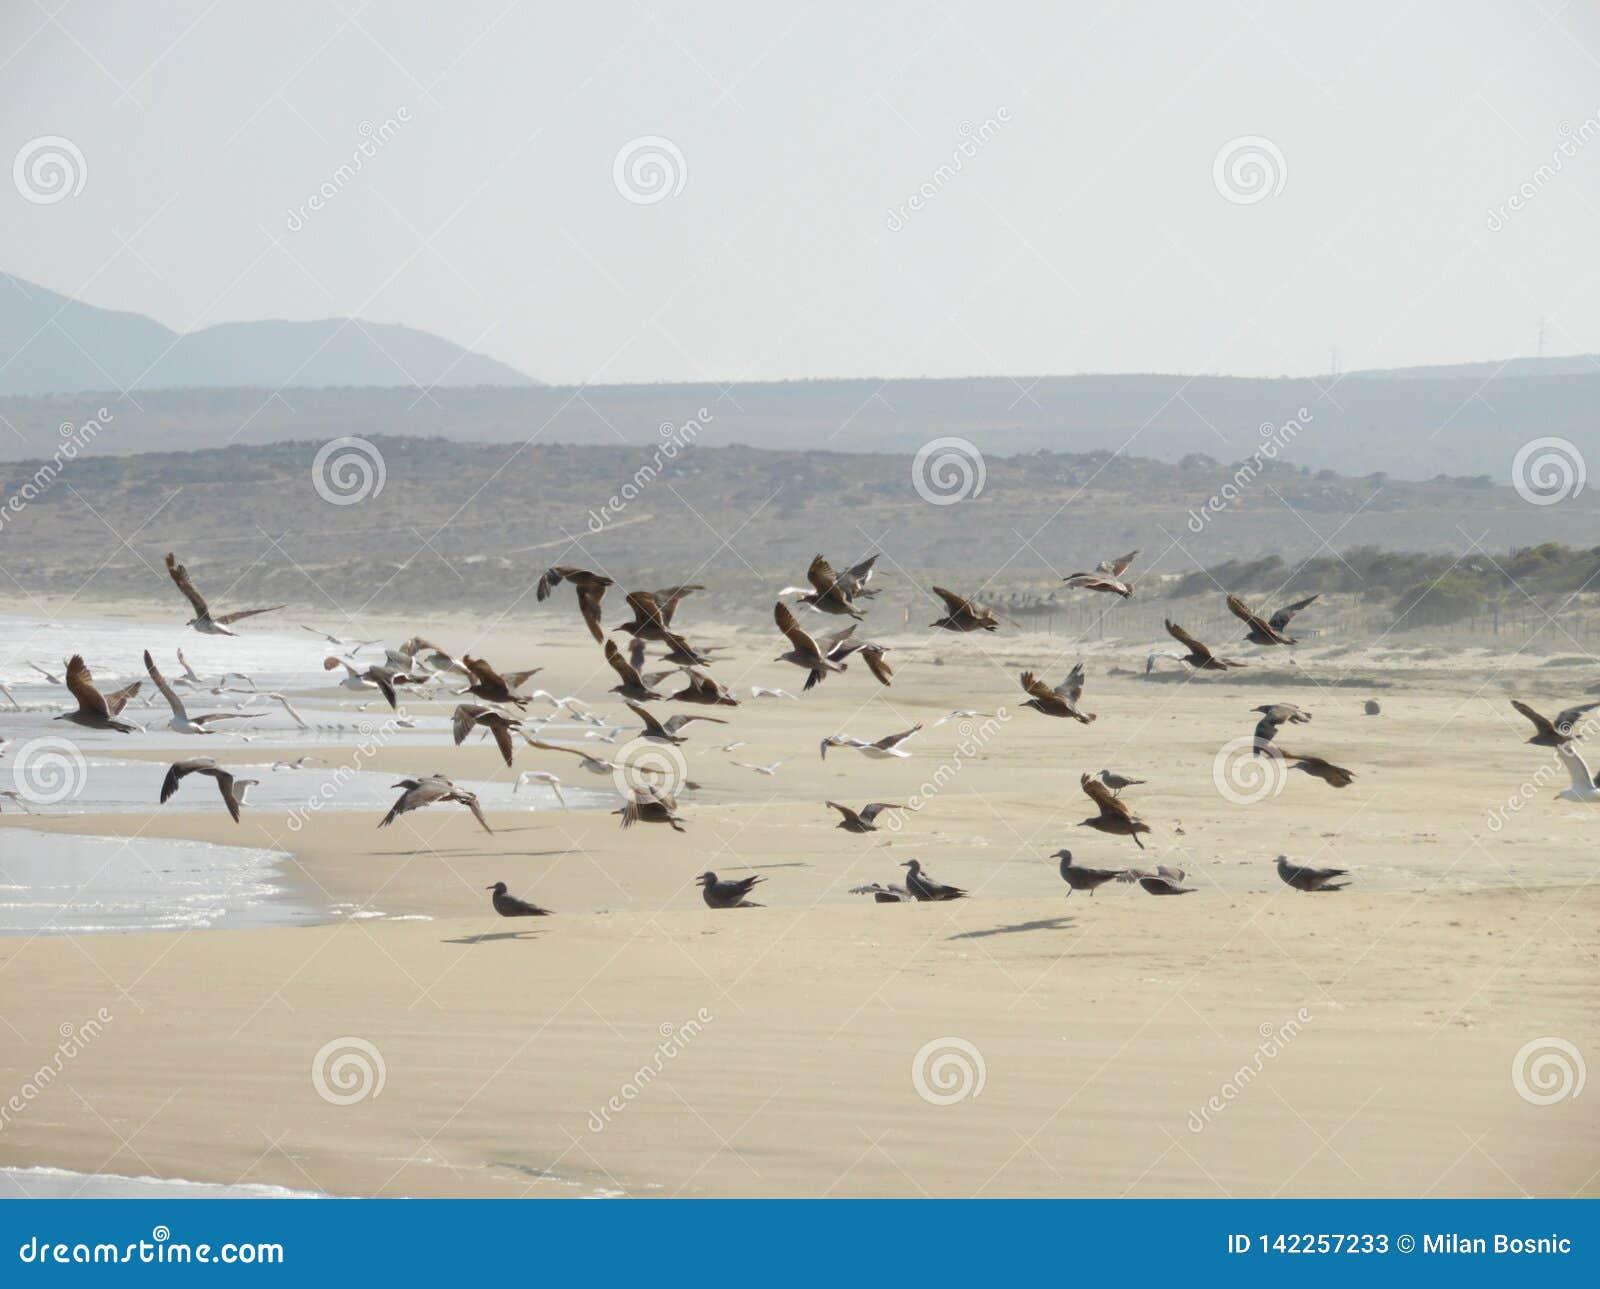 Flock of Seagulls taking flight